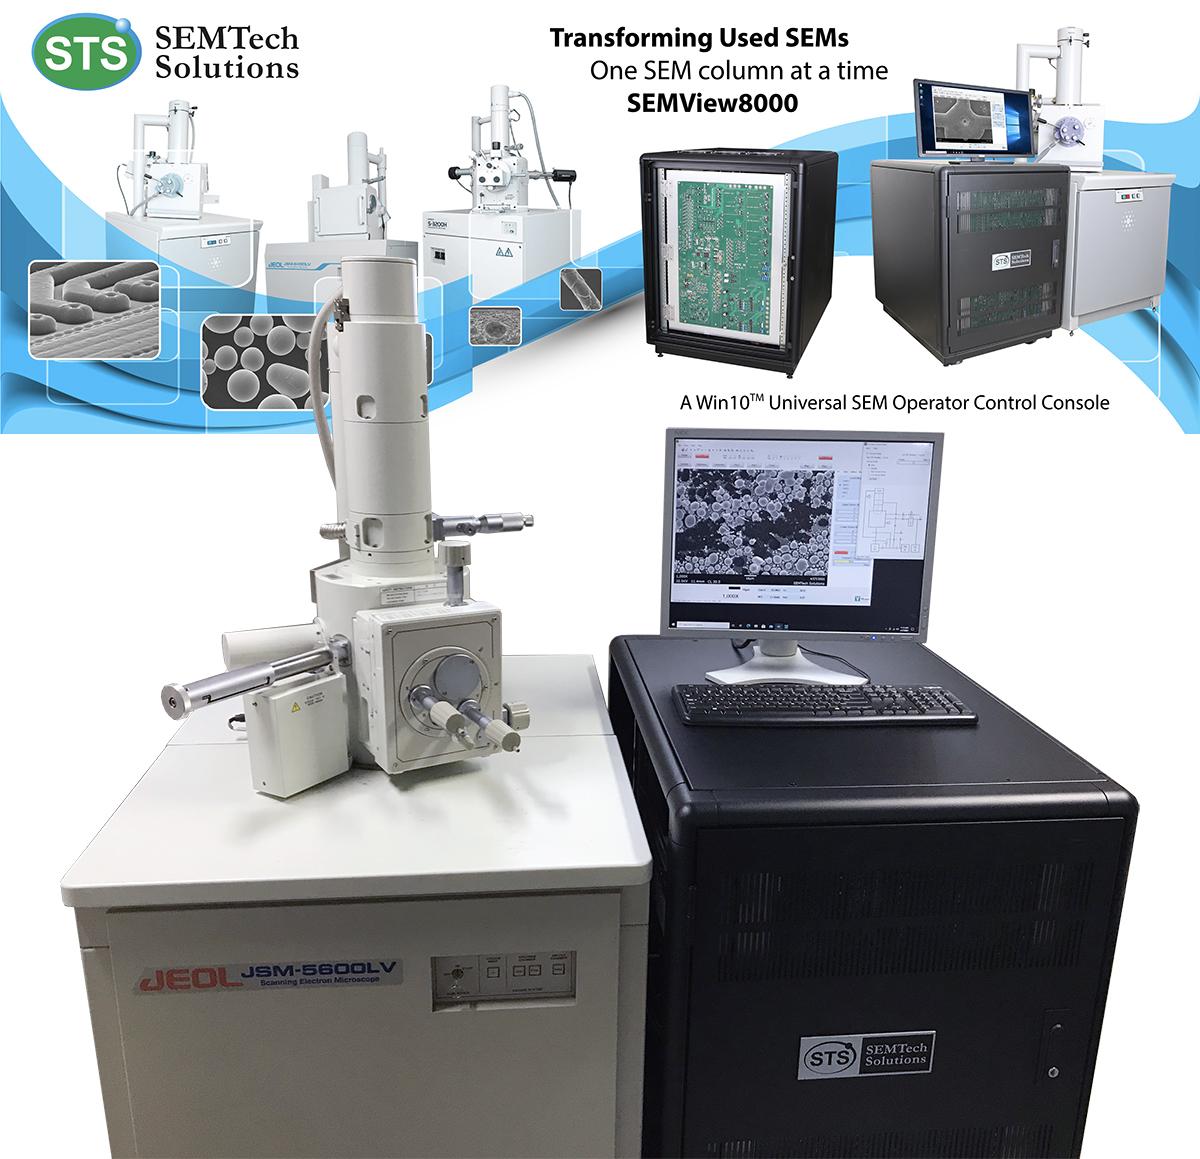 JEOL JSM-5600LV SEM with SEMTech Solutions' SEMView8000